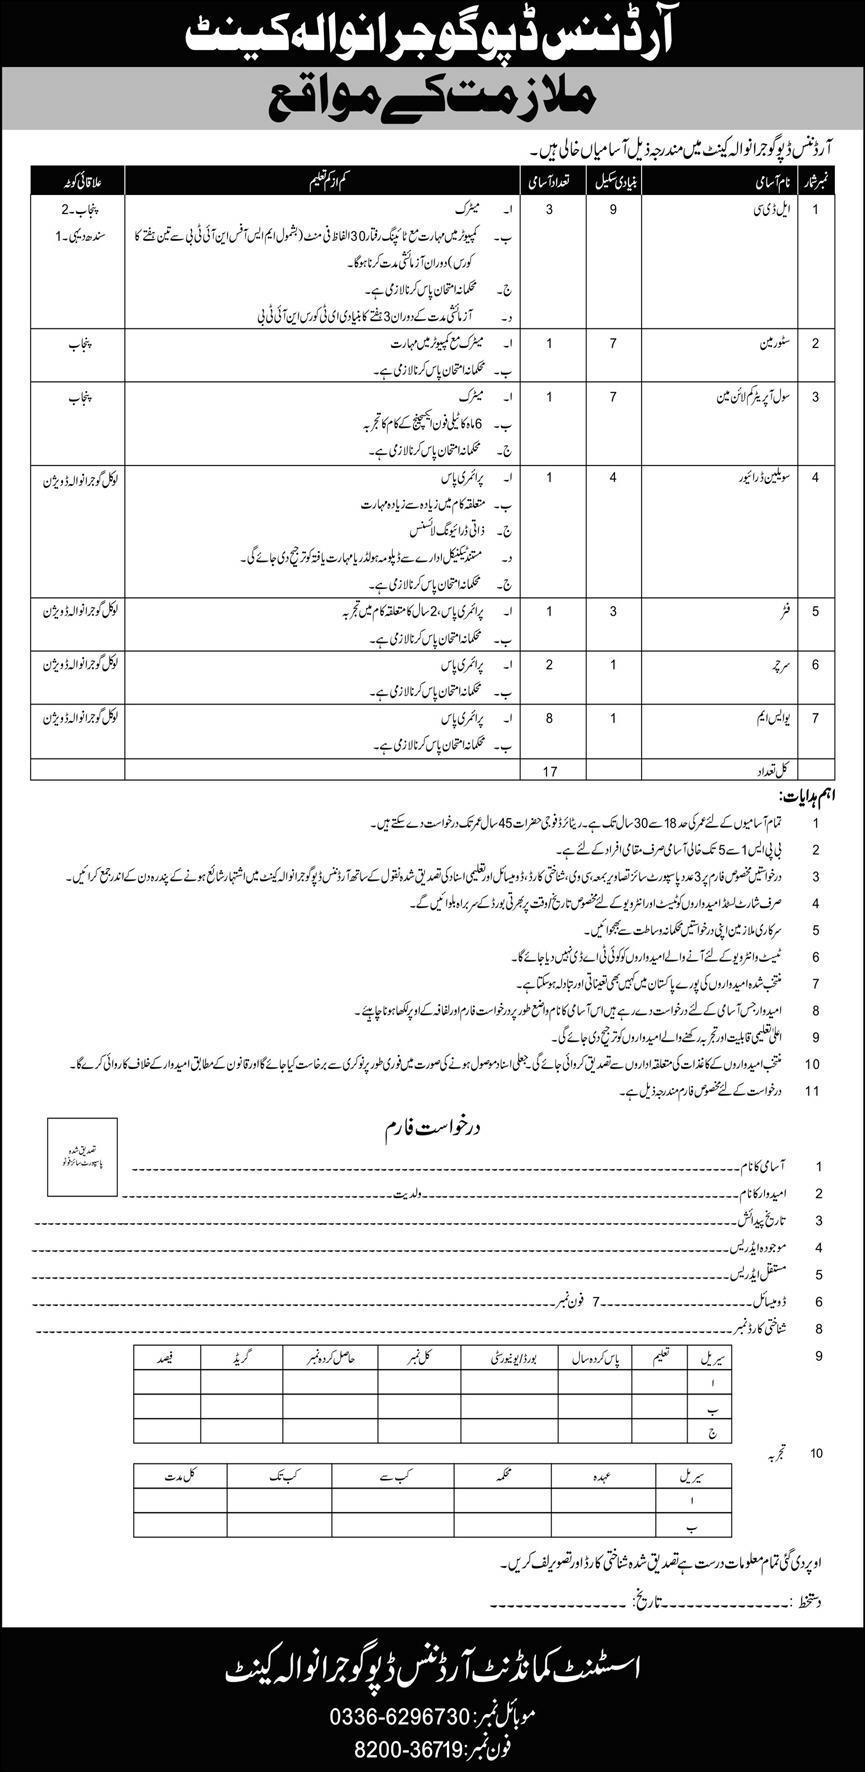 Pakistan Army Ordnance Depot Gujranwala Cantt Jobs 2020